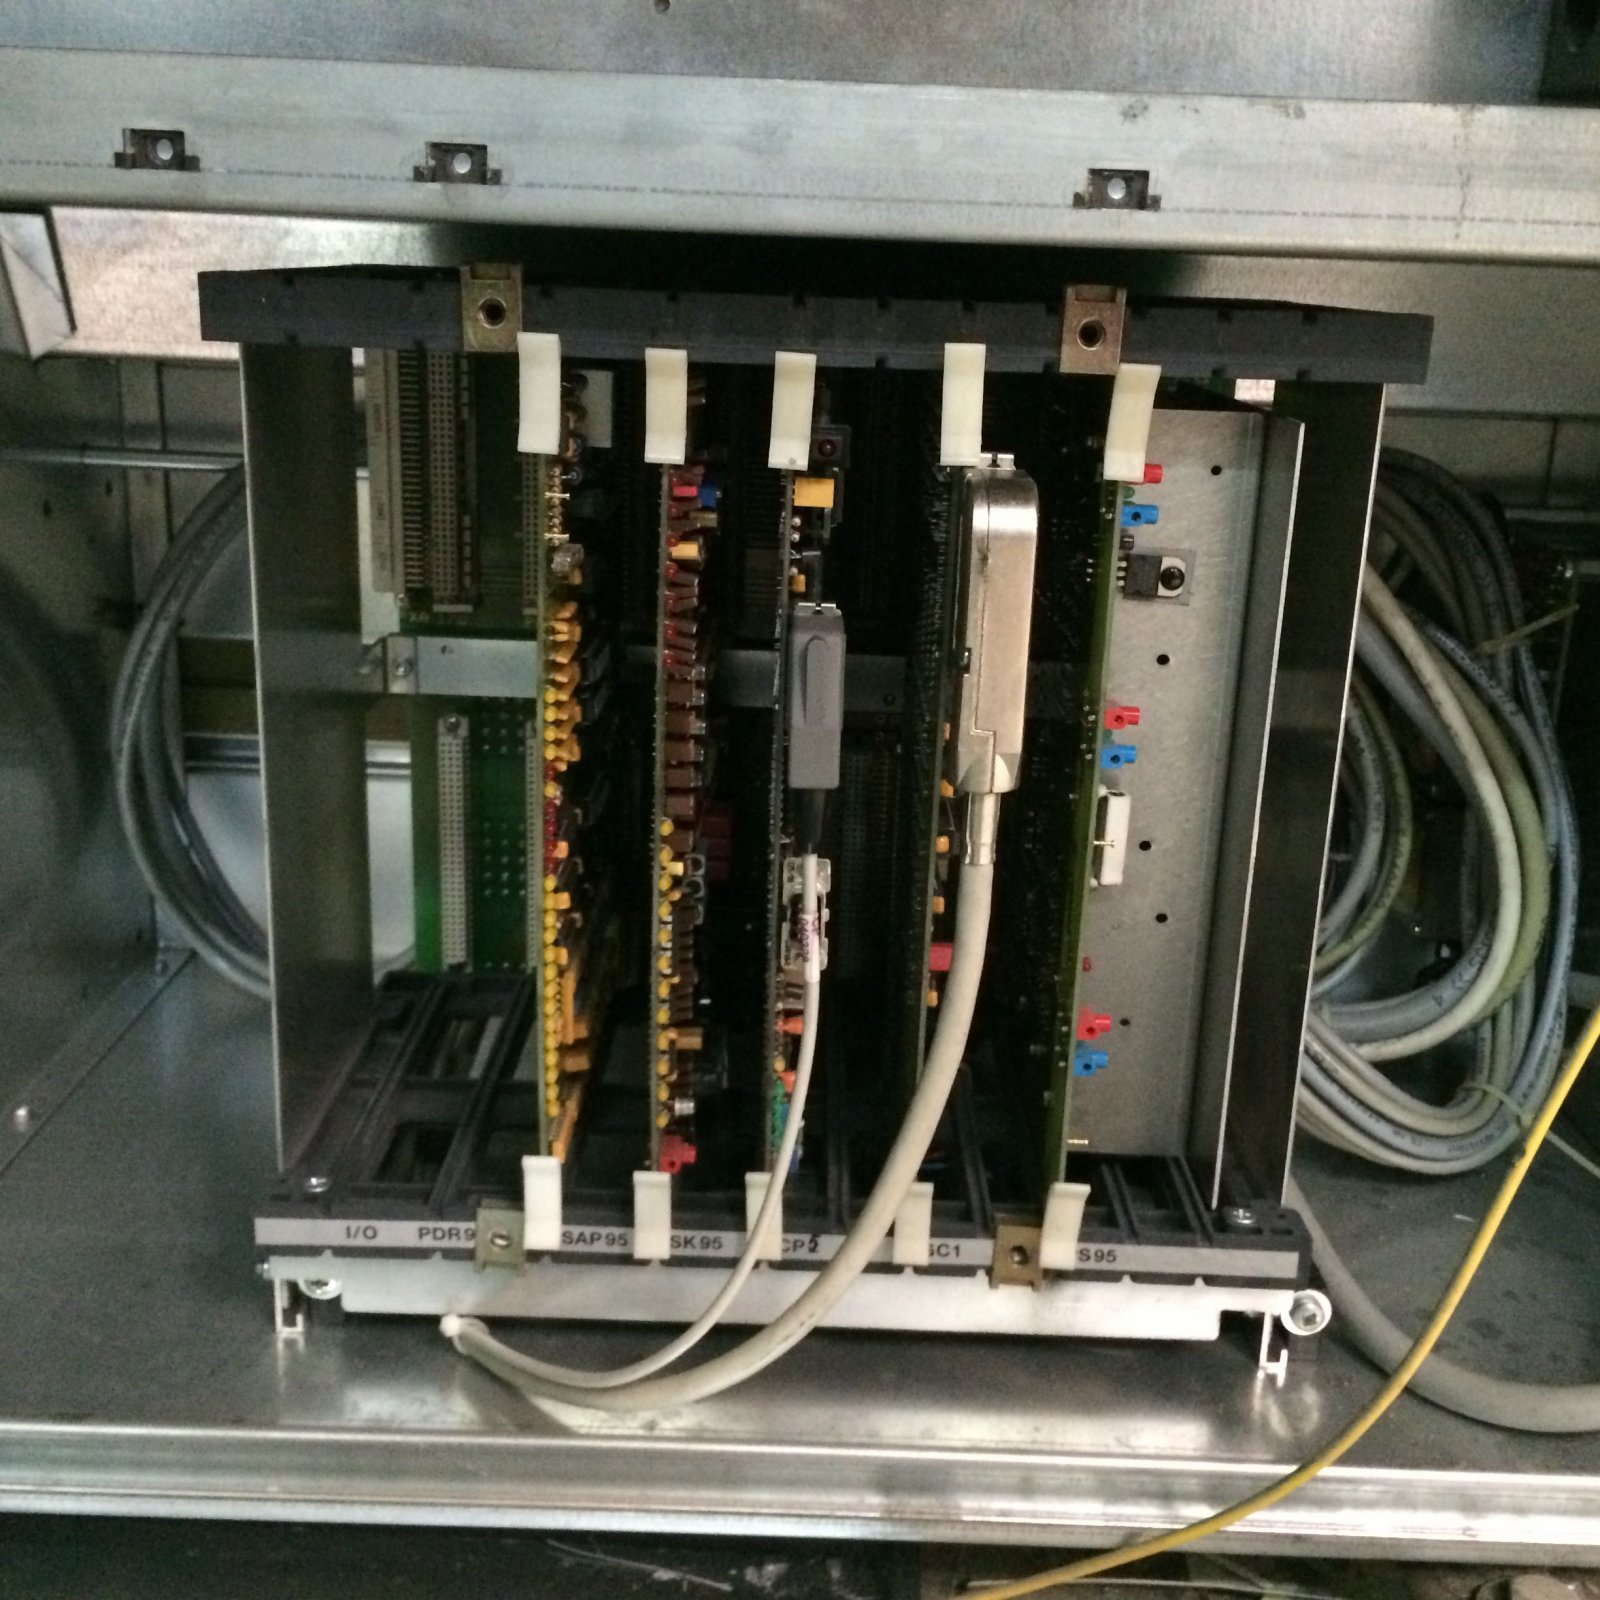 polar emc 92 monitor error scan reference point color printing forum rh colorprintingforum com Polar RS300X Polar 115 Cutter